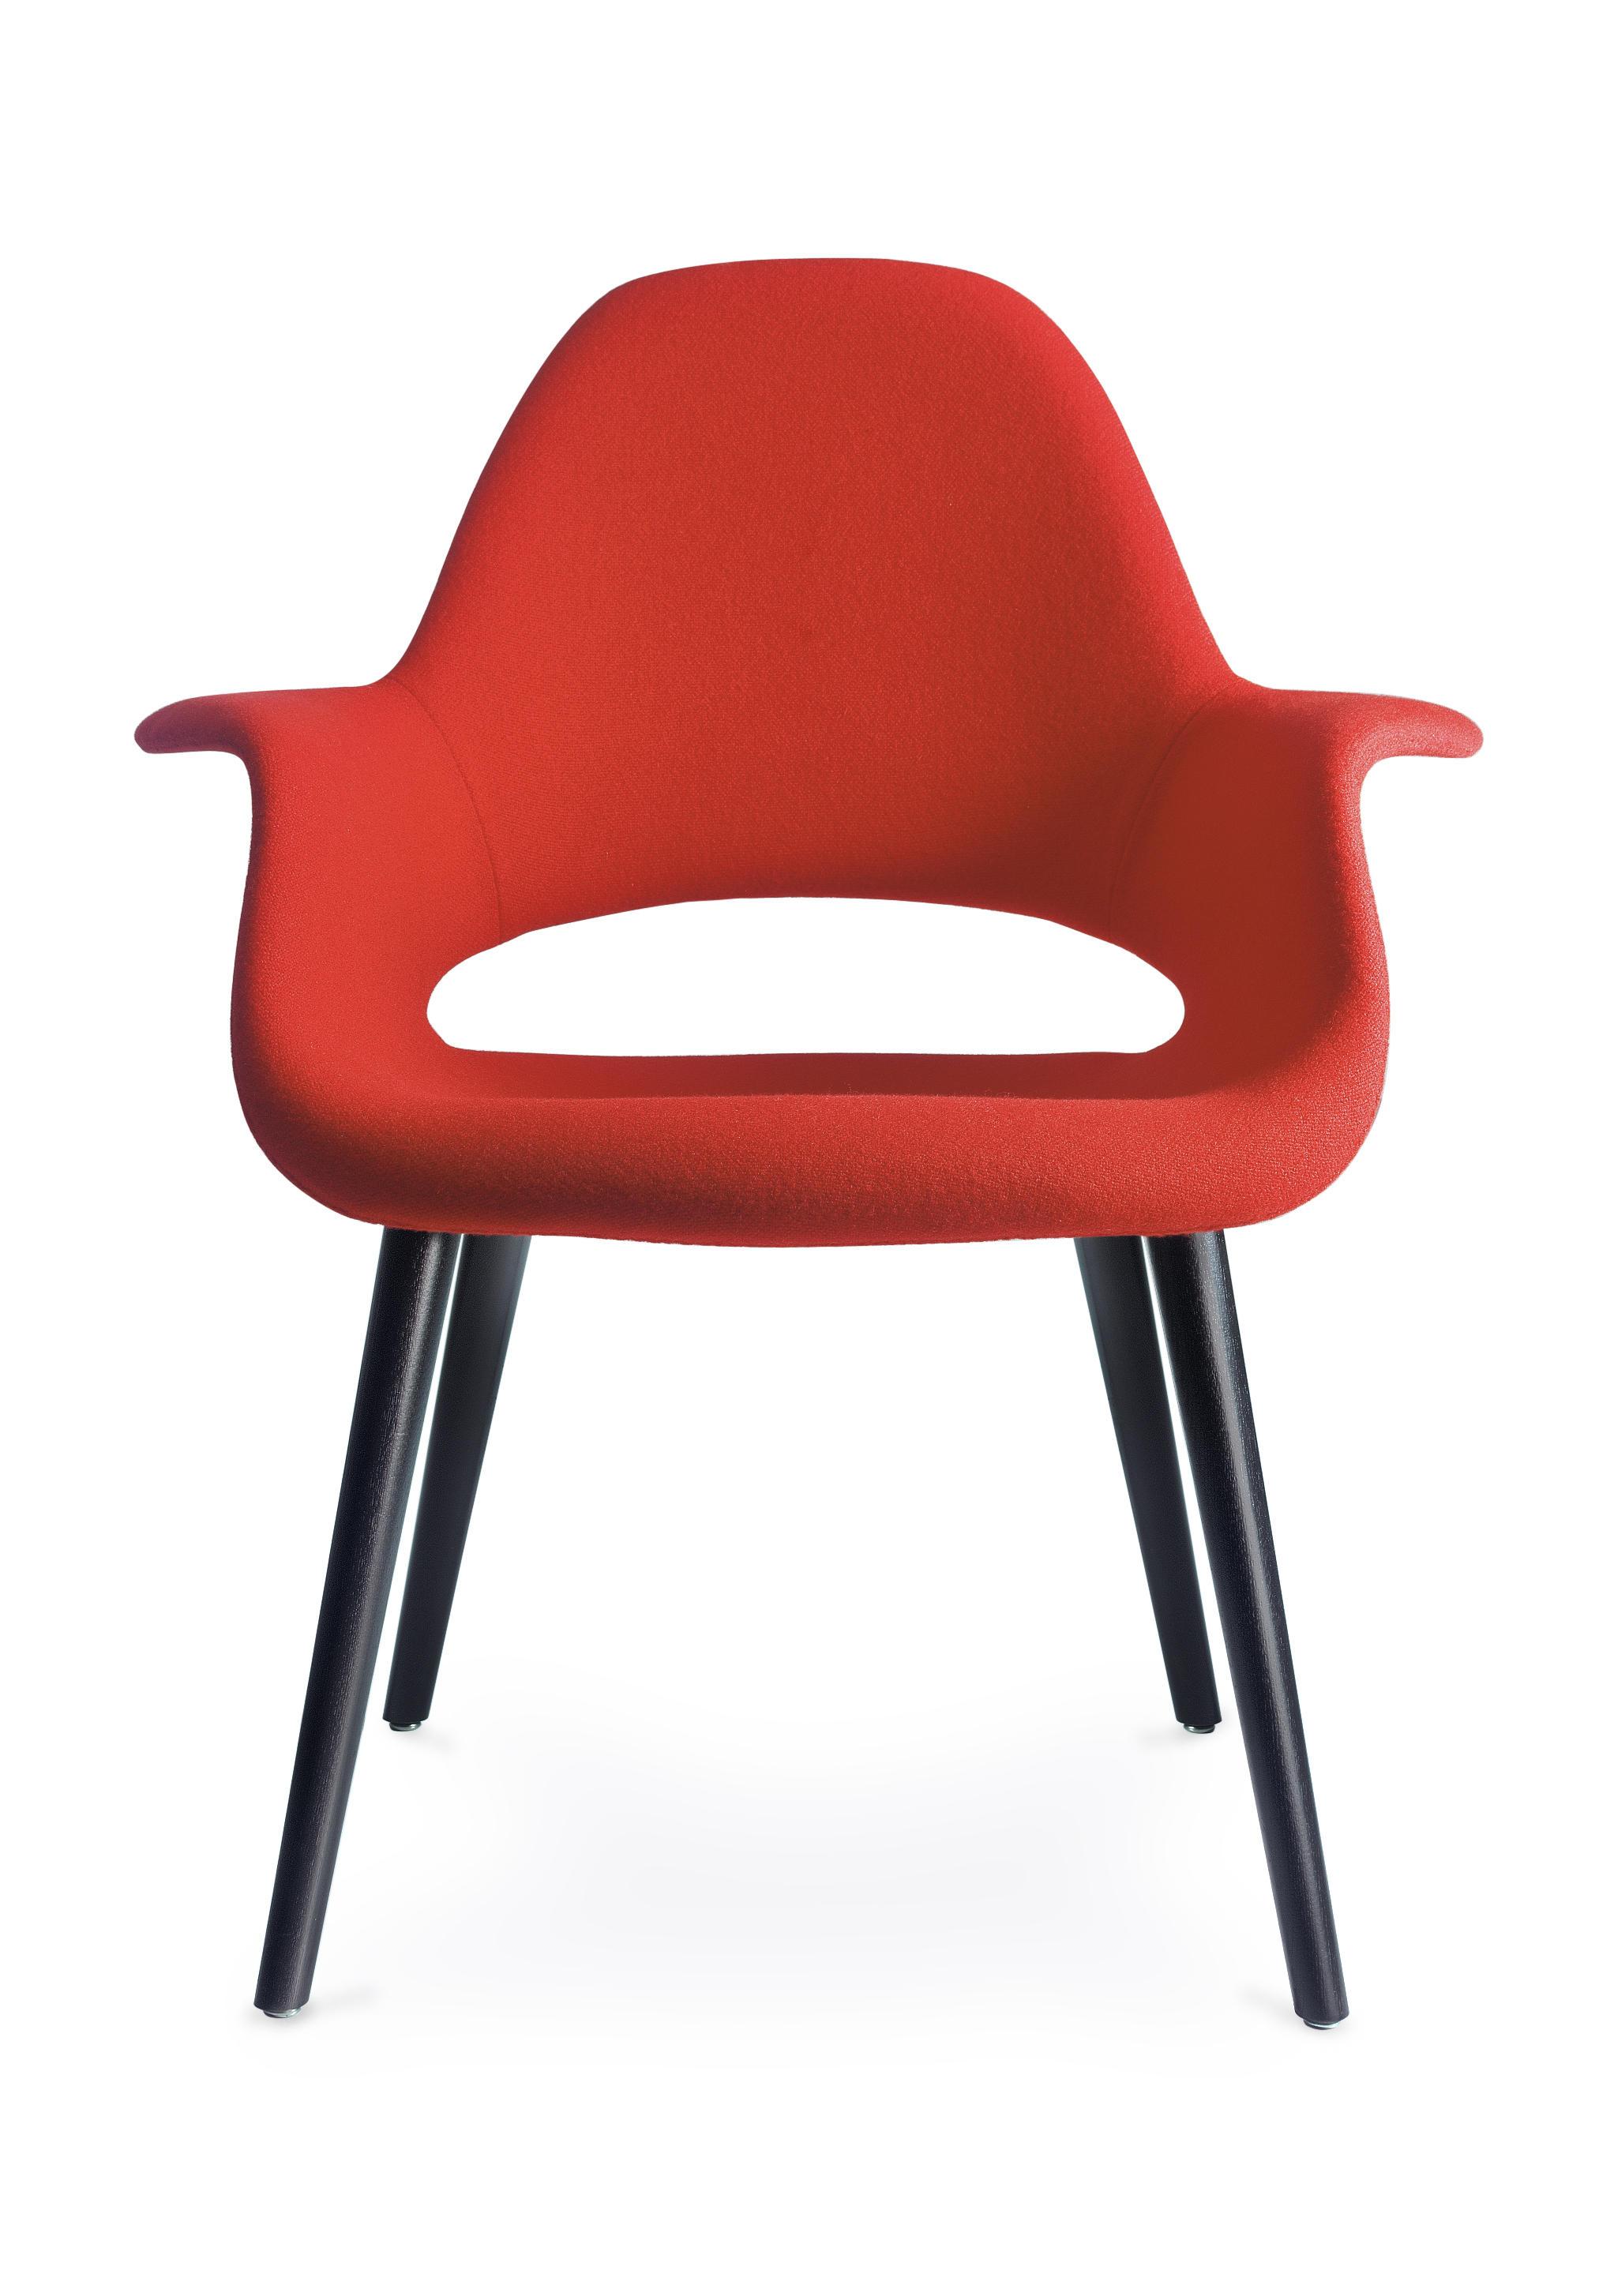 organic chair sillas de visita de vitra architonic. Black Bedroom Furniture Sets. Home Design Ideas